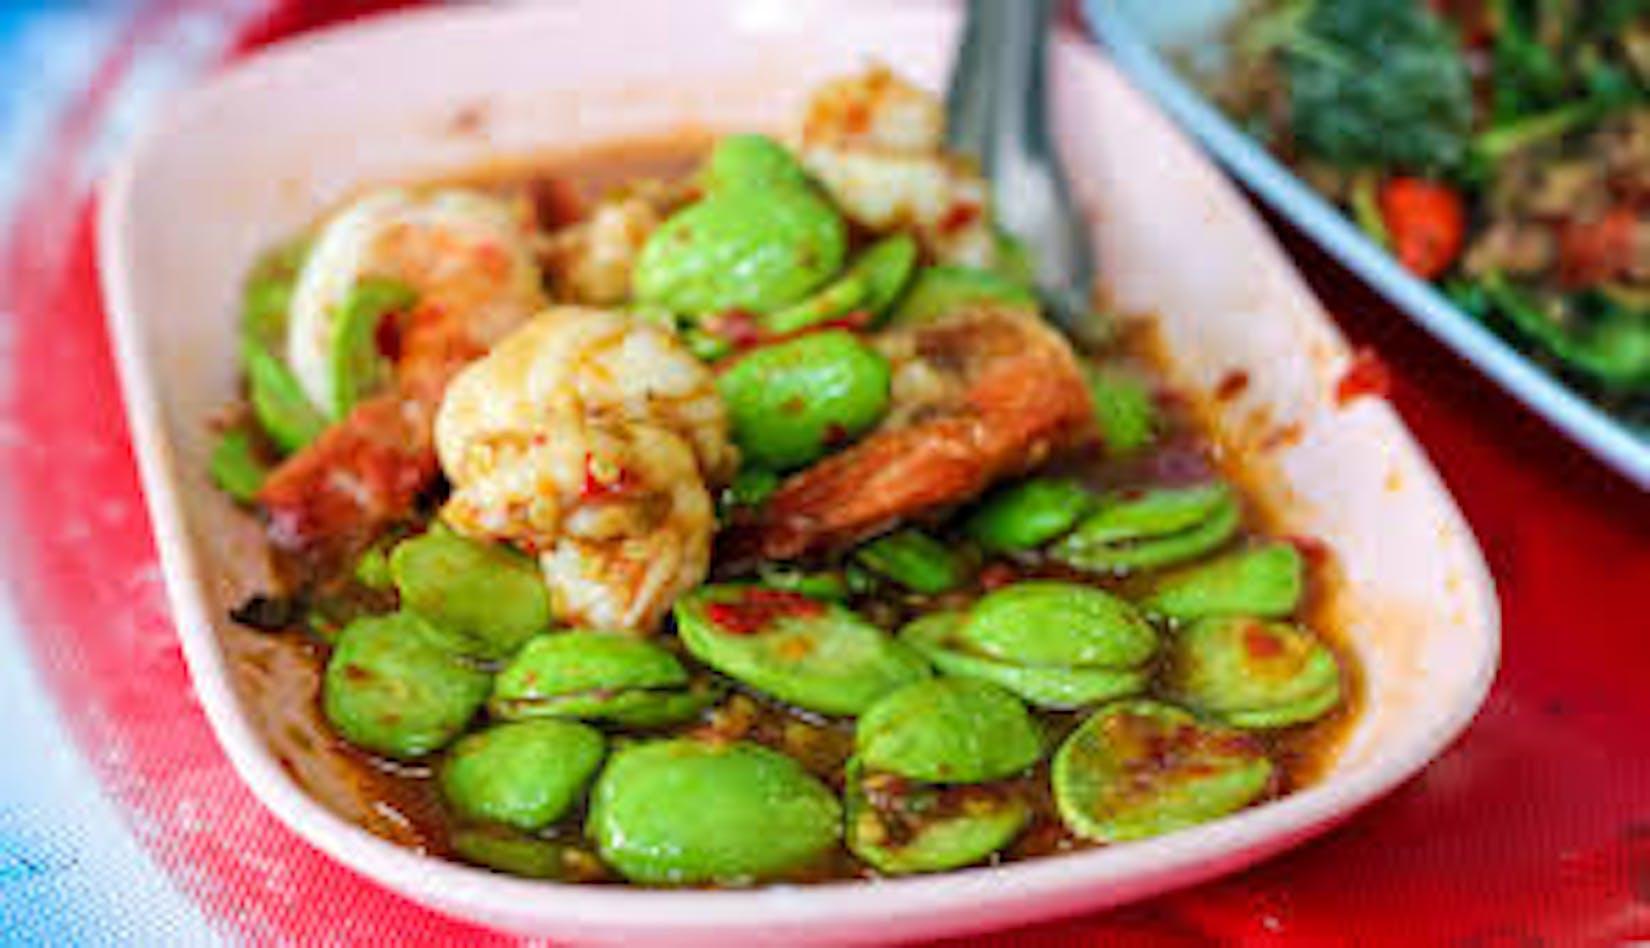 Shwe White Thai Food & Drink | yathar